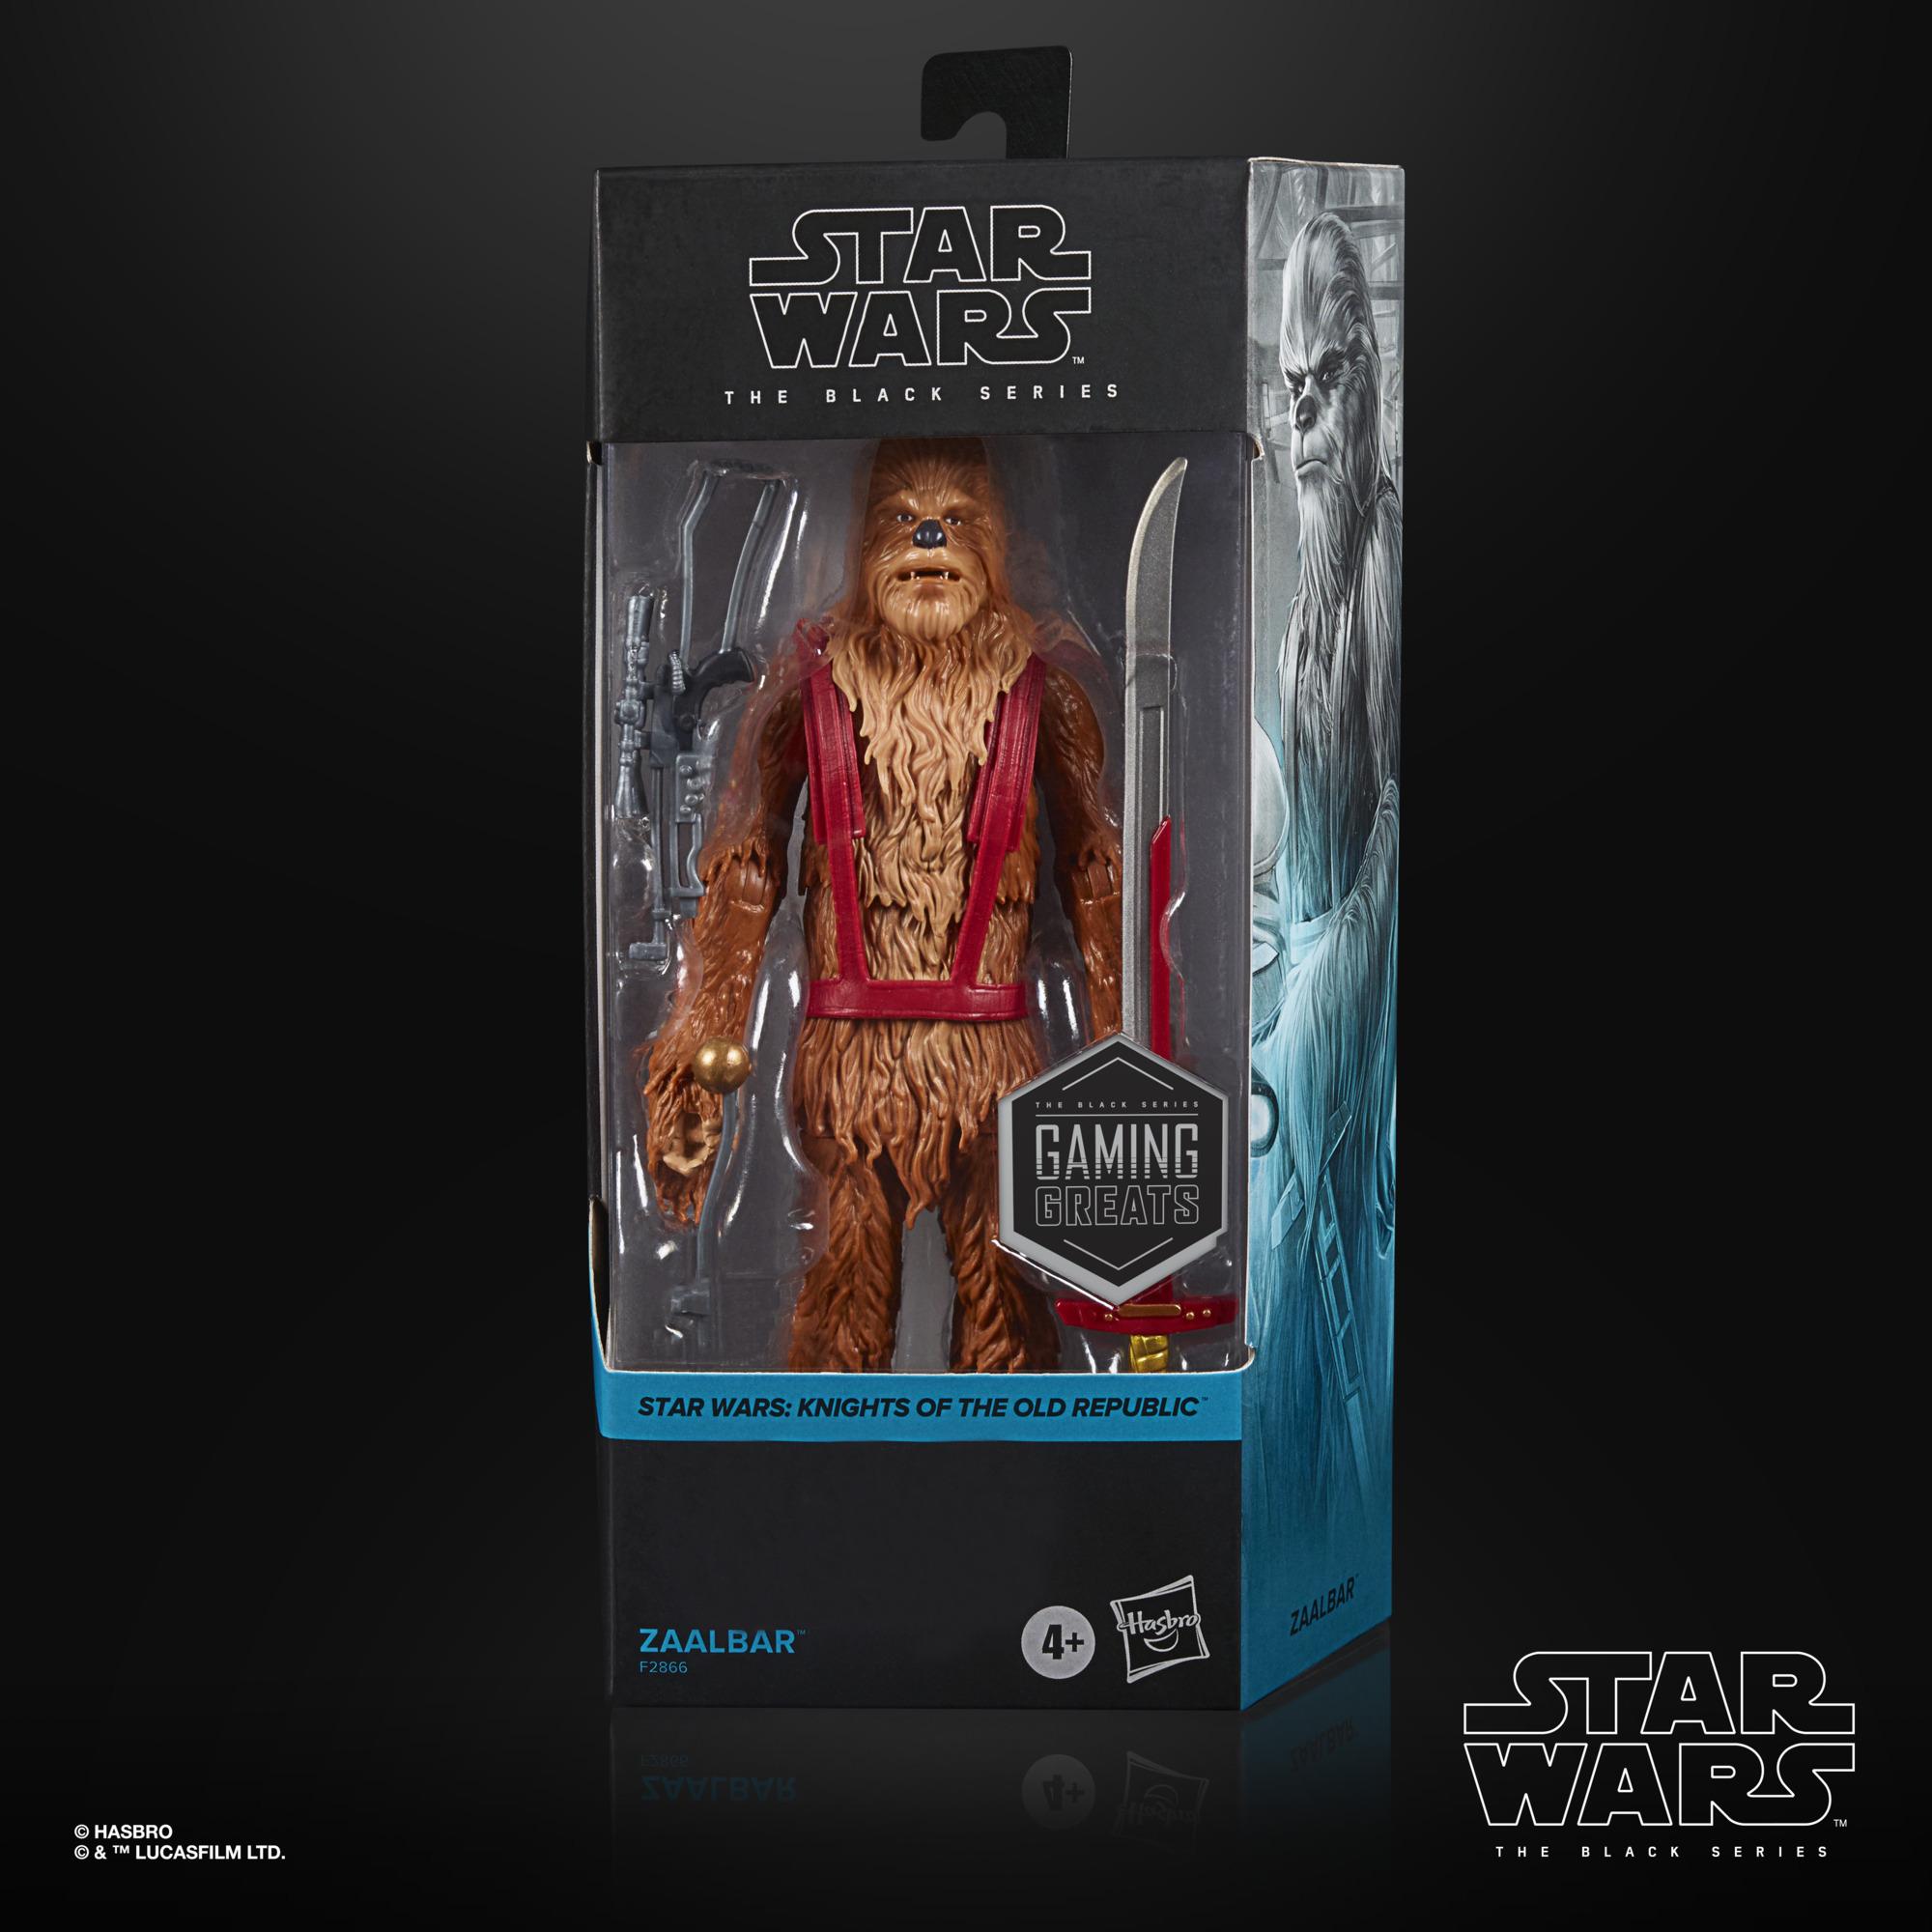 Star Wars The Black Series Gaming Greats – Zaalbar 6-Inch Figure F2866